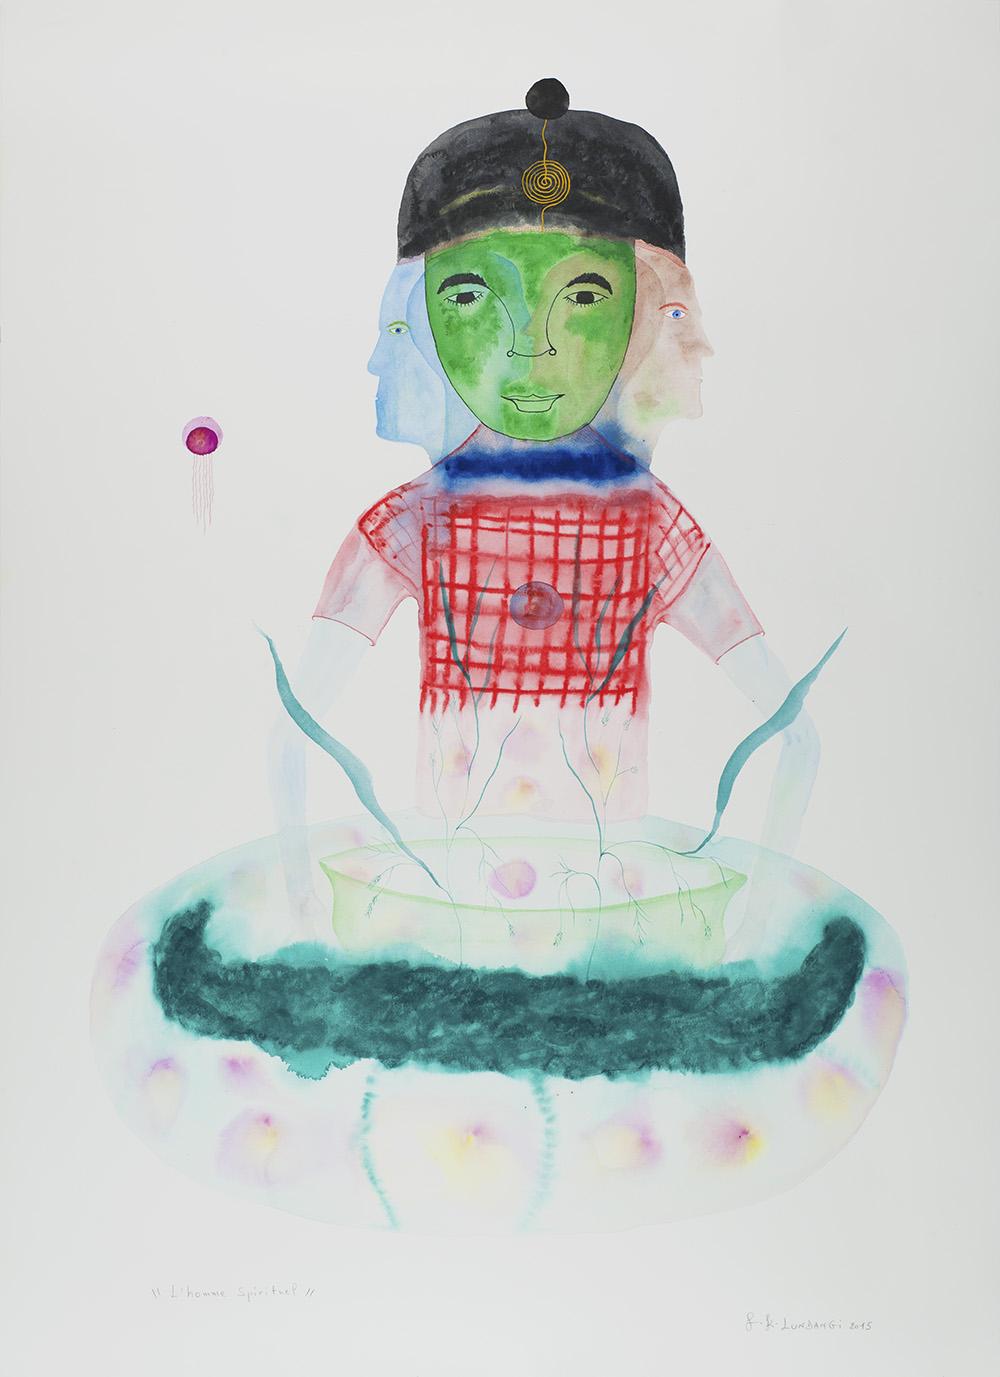 Franck K. Lundangi    L'homme Spirituel  , 2015 Watercolor, ink on paper 41 x 29.5 inches 104.1 x 74.9 cm FLu 36